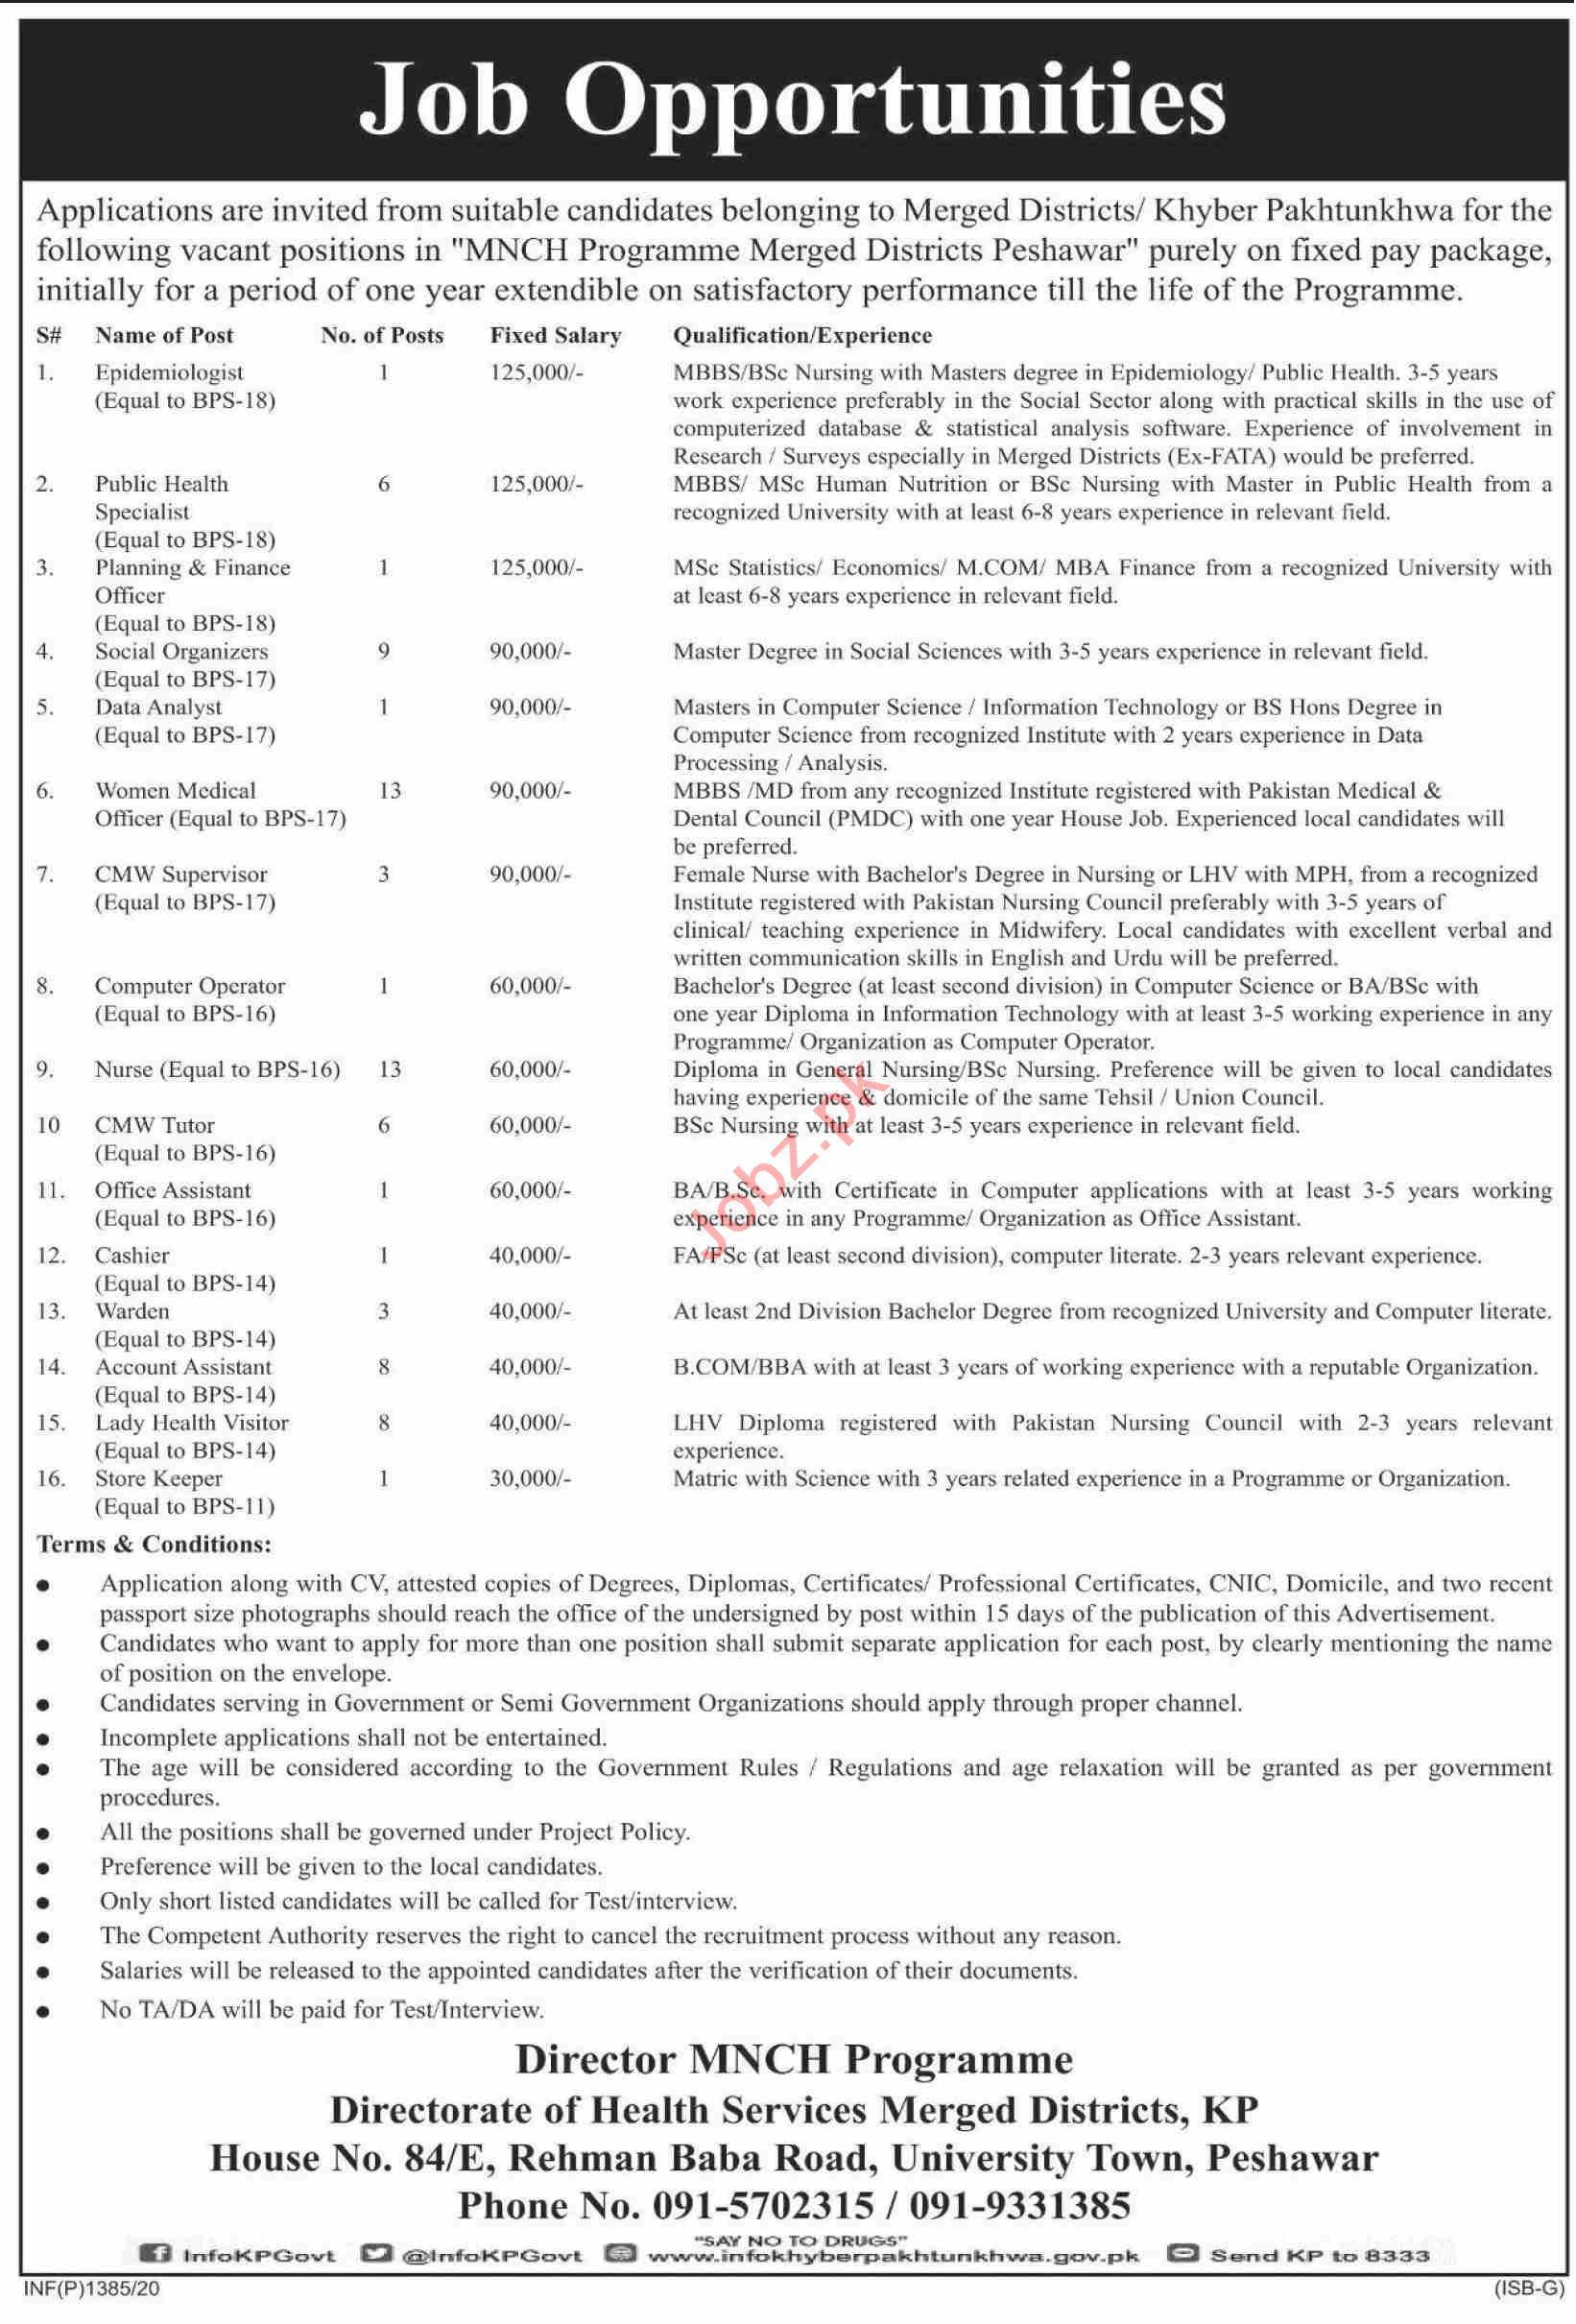 MNCH Programme Merged Districts Peshawar Jobs 2020